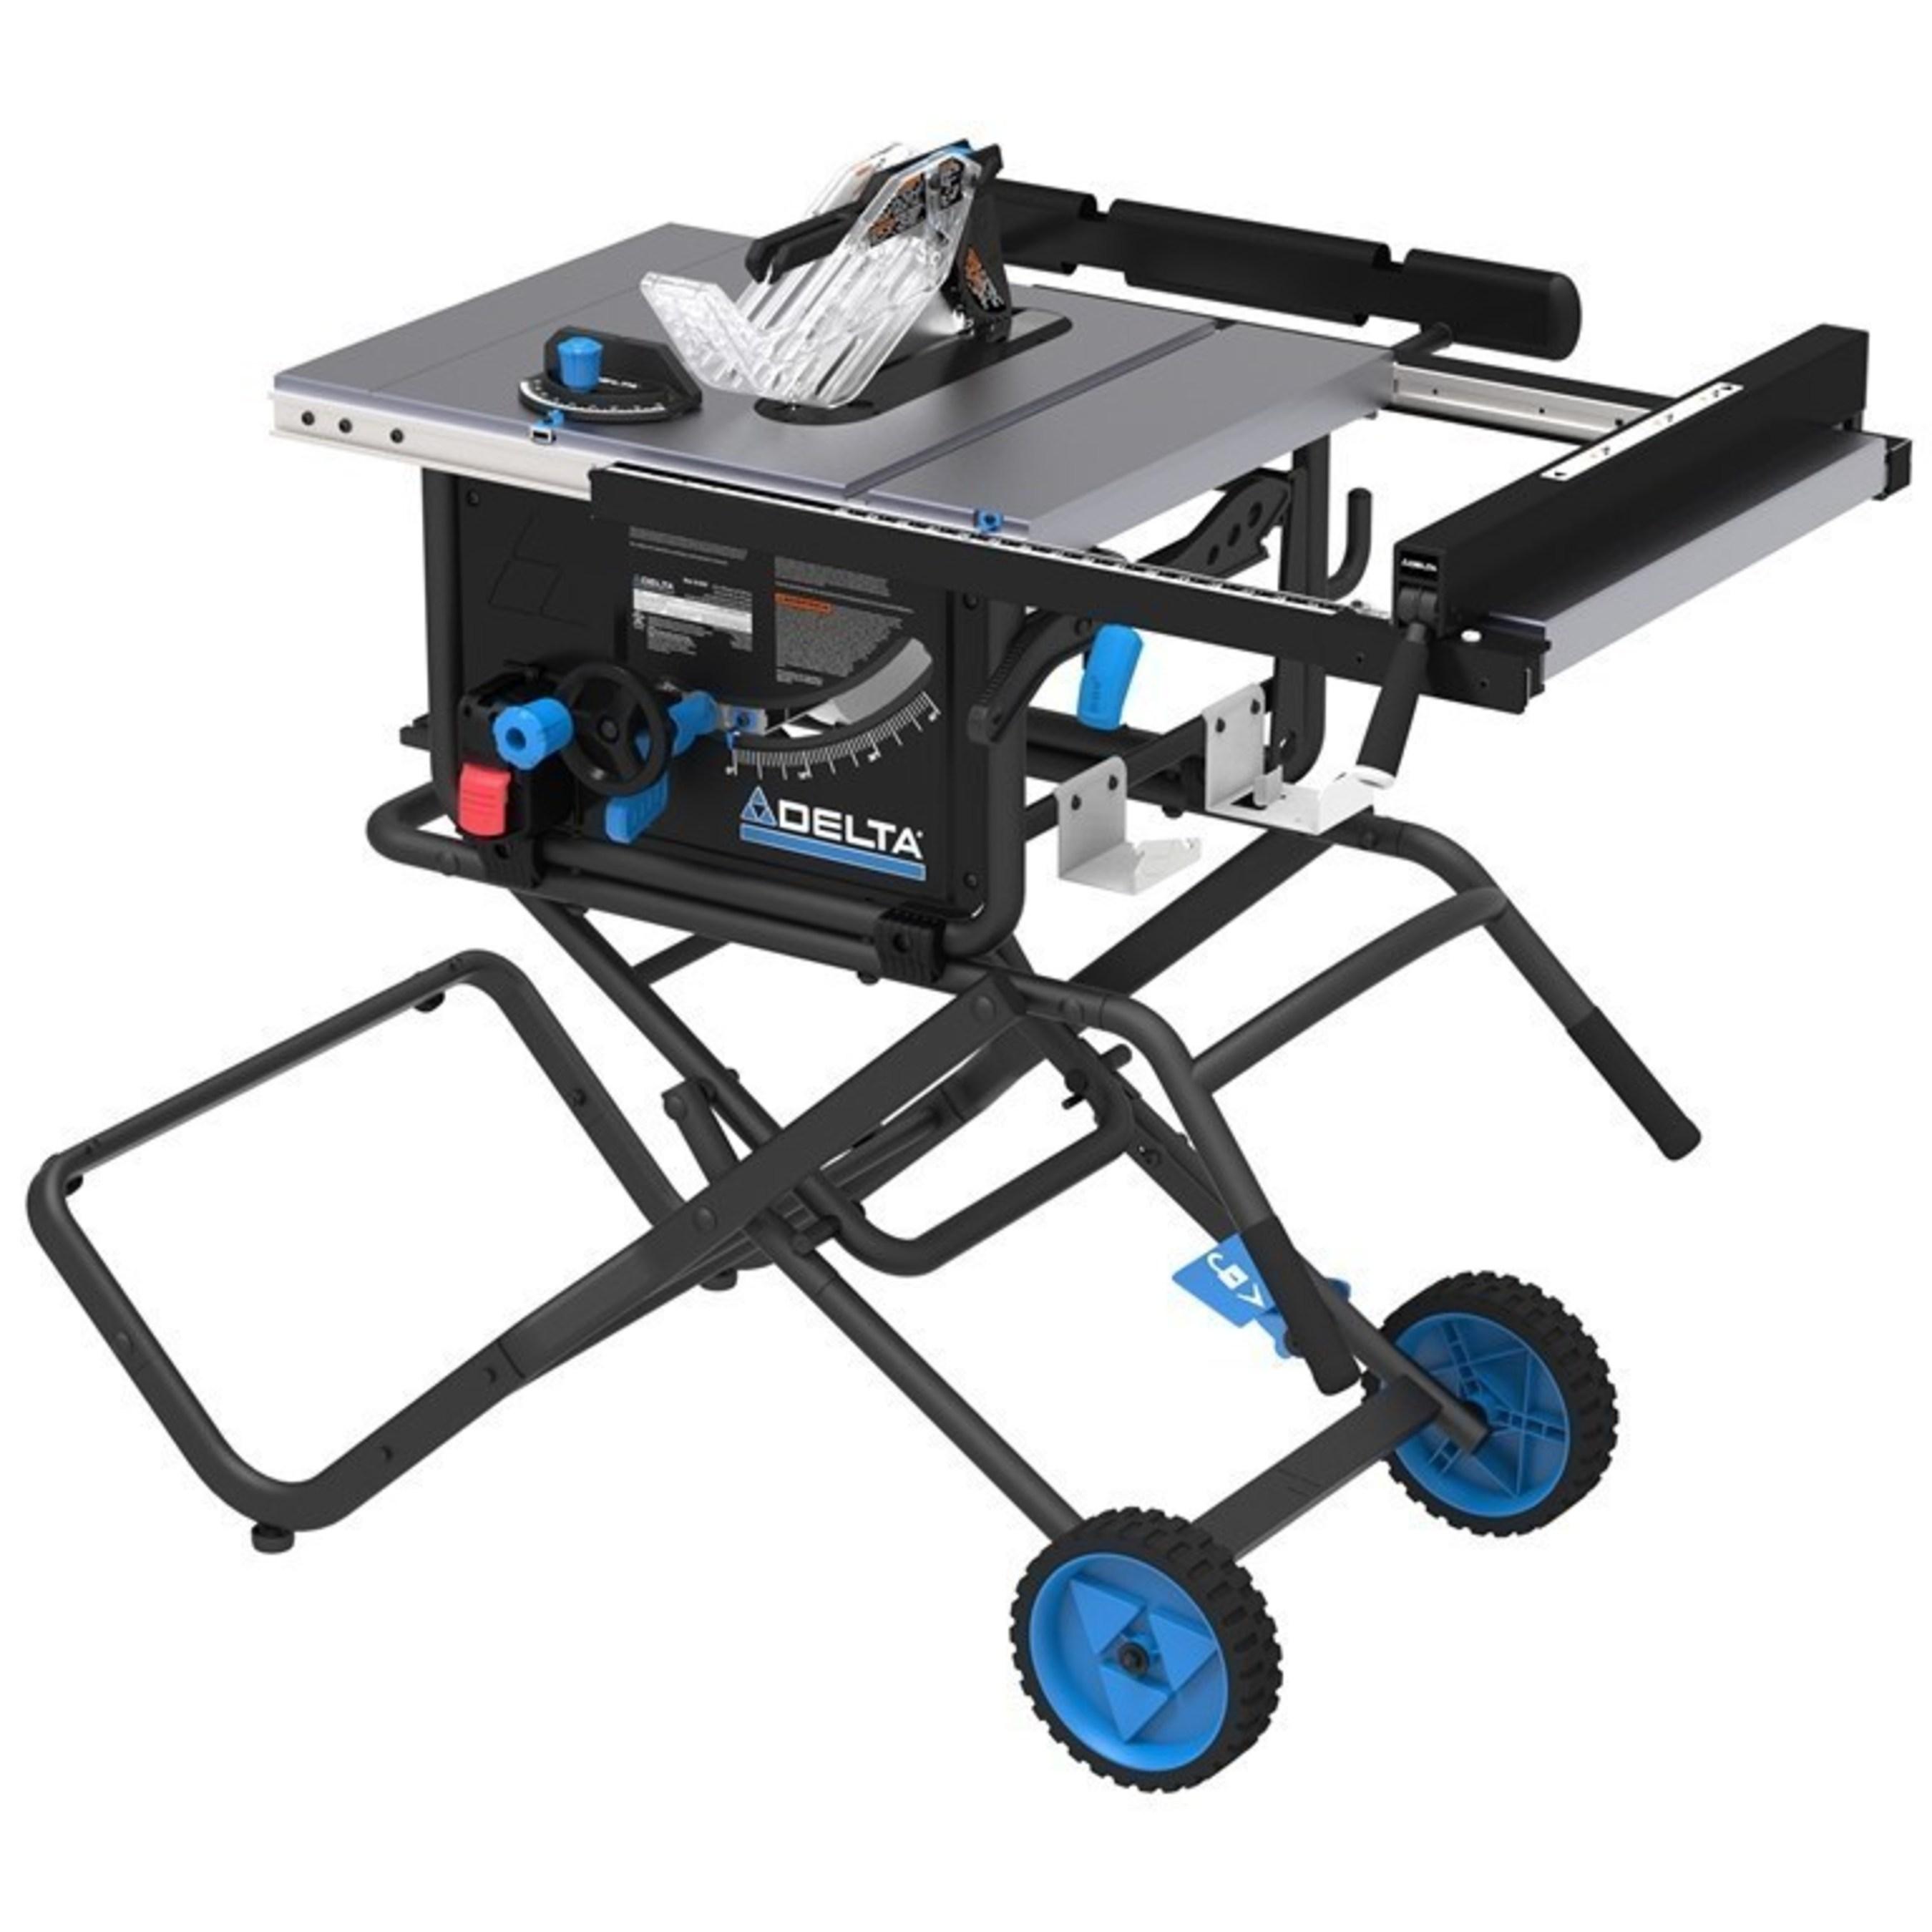 "Delta 36-6022 10"" Portable Table Saw"